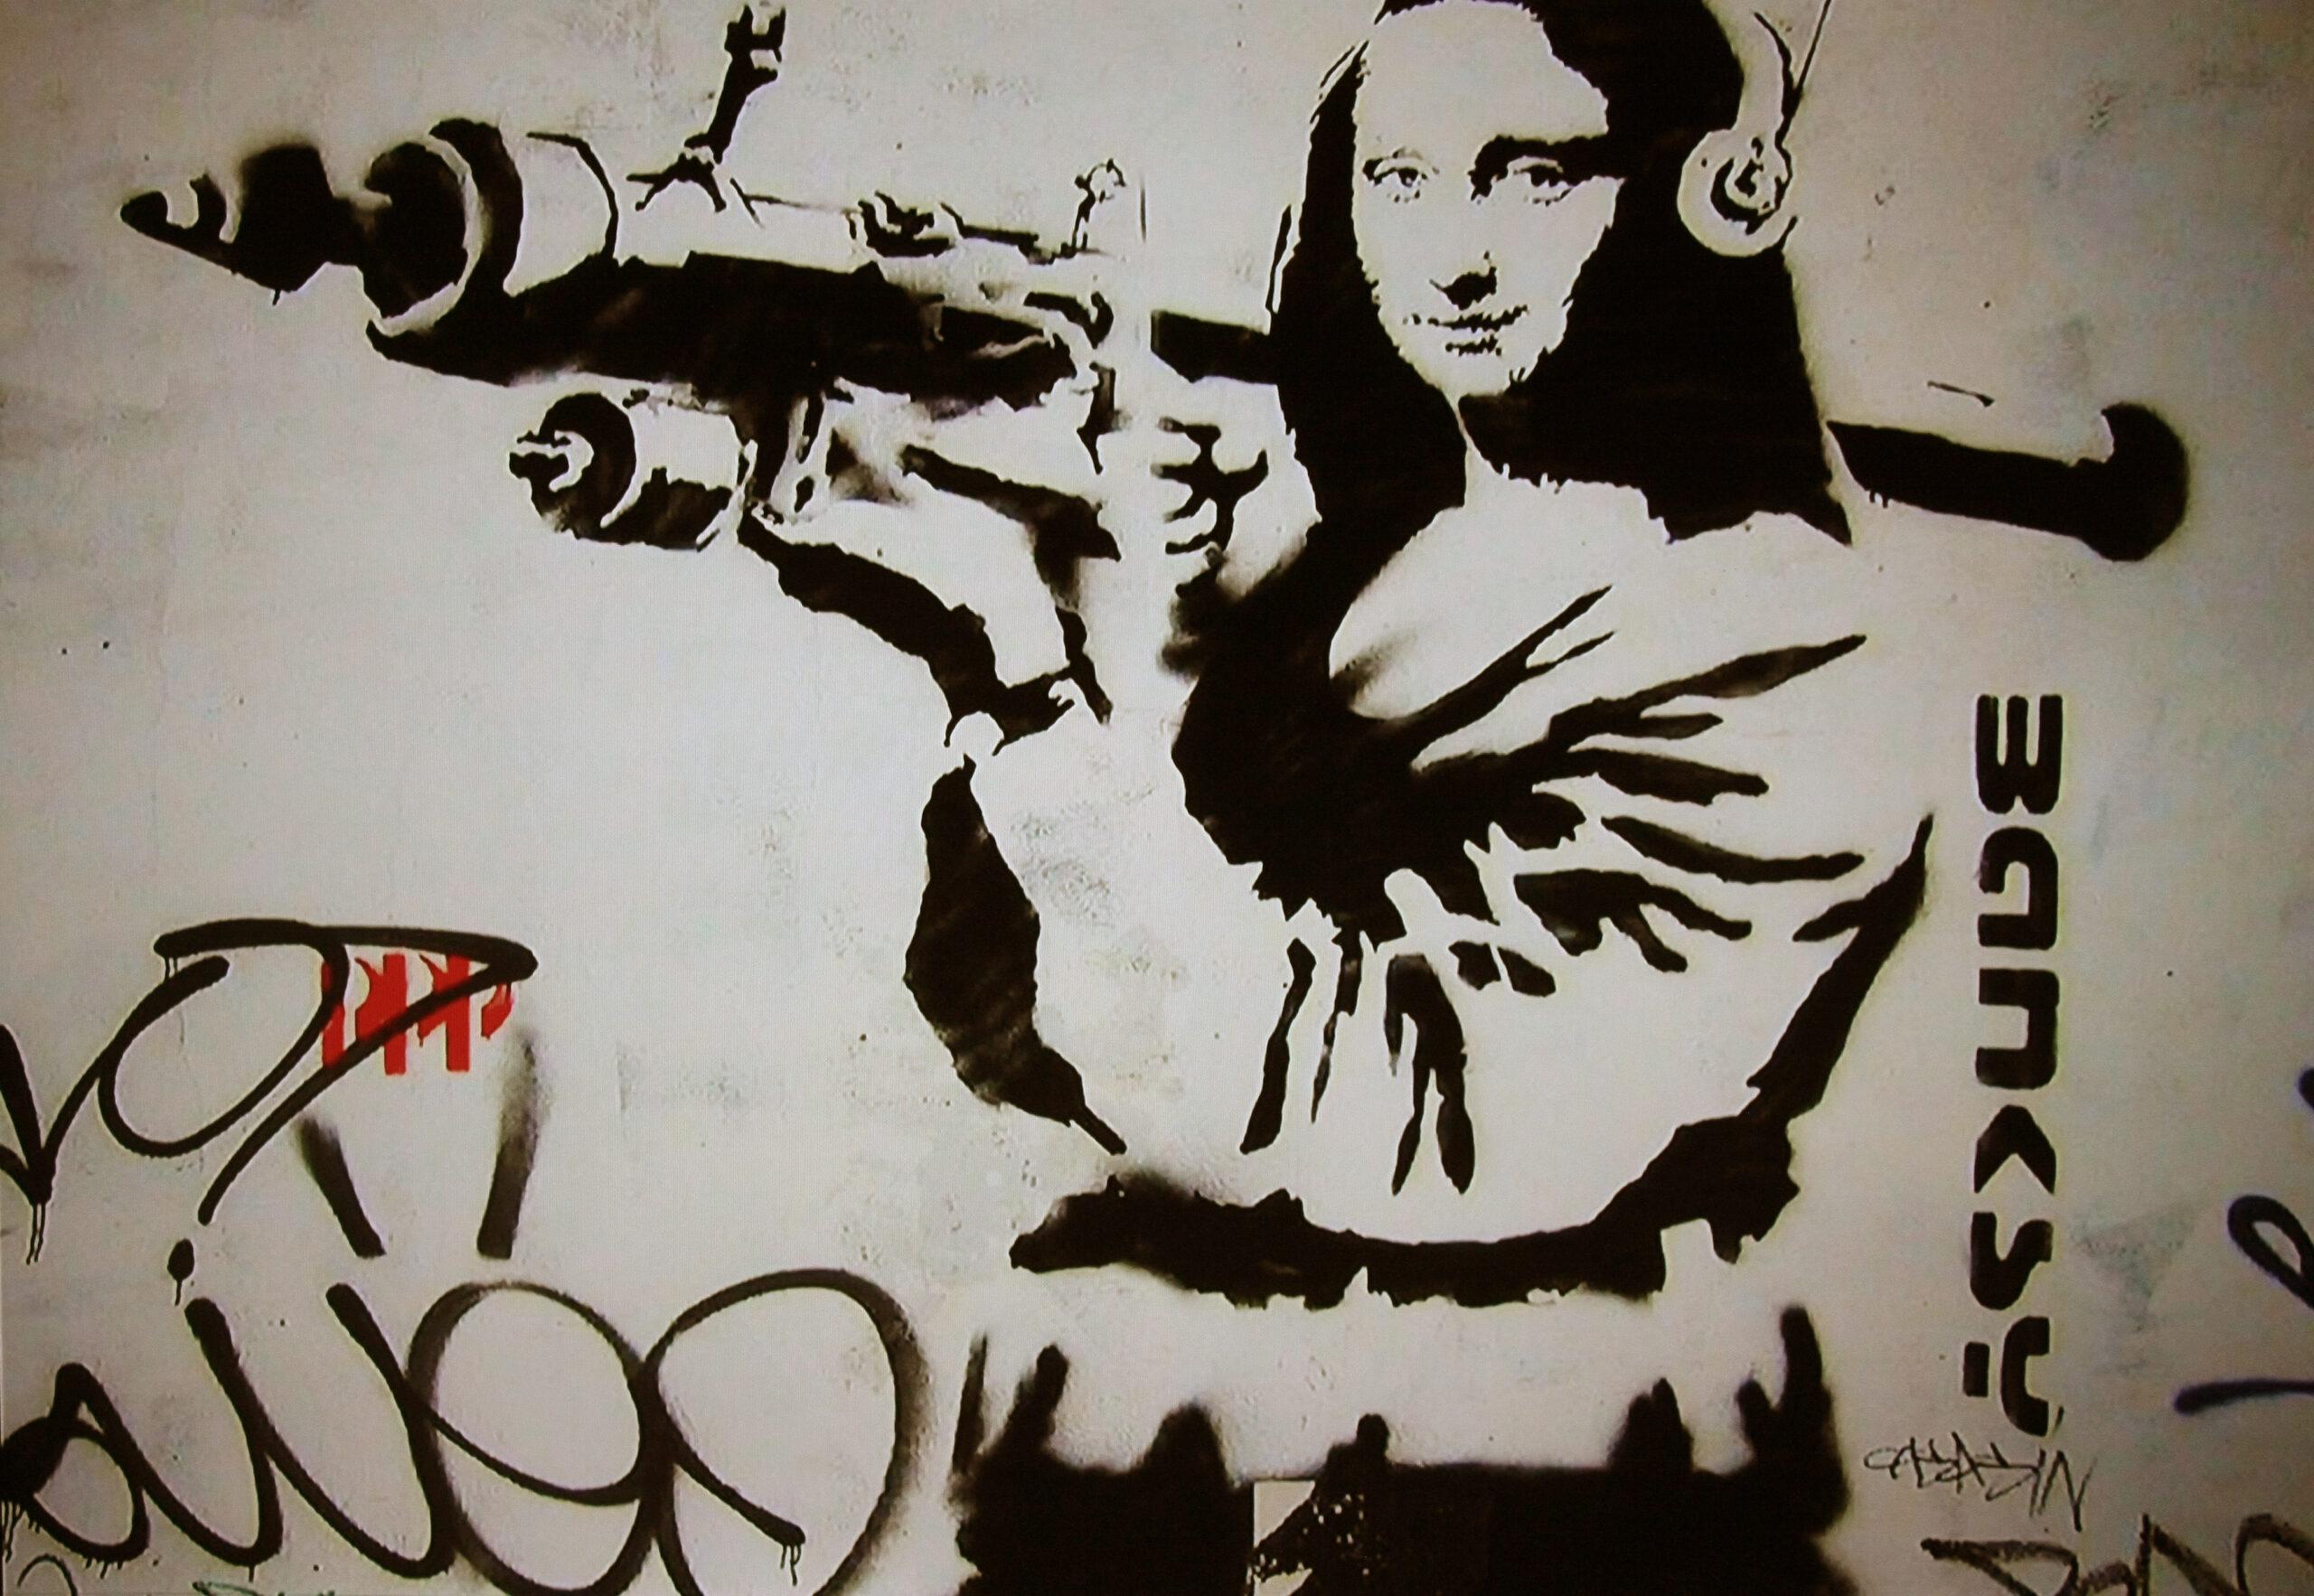 Bansky-Leonardo-da-vinci-street-art-magazinehorse